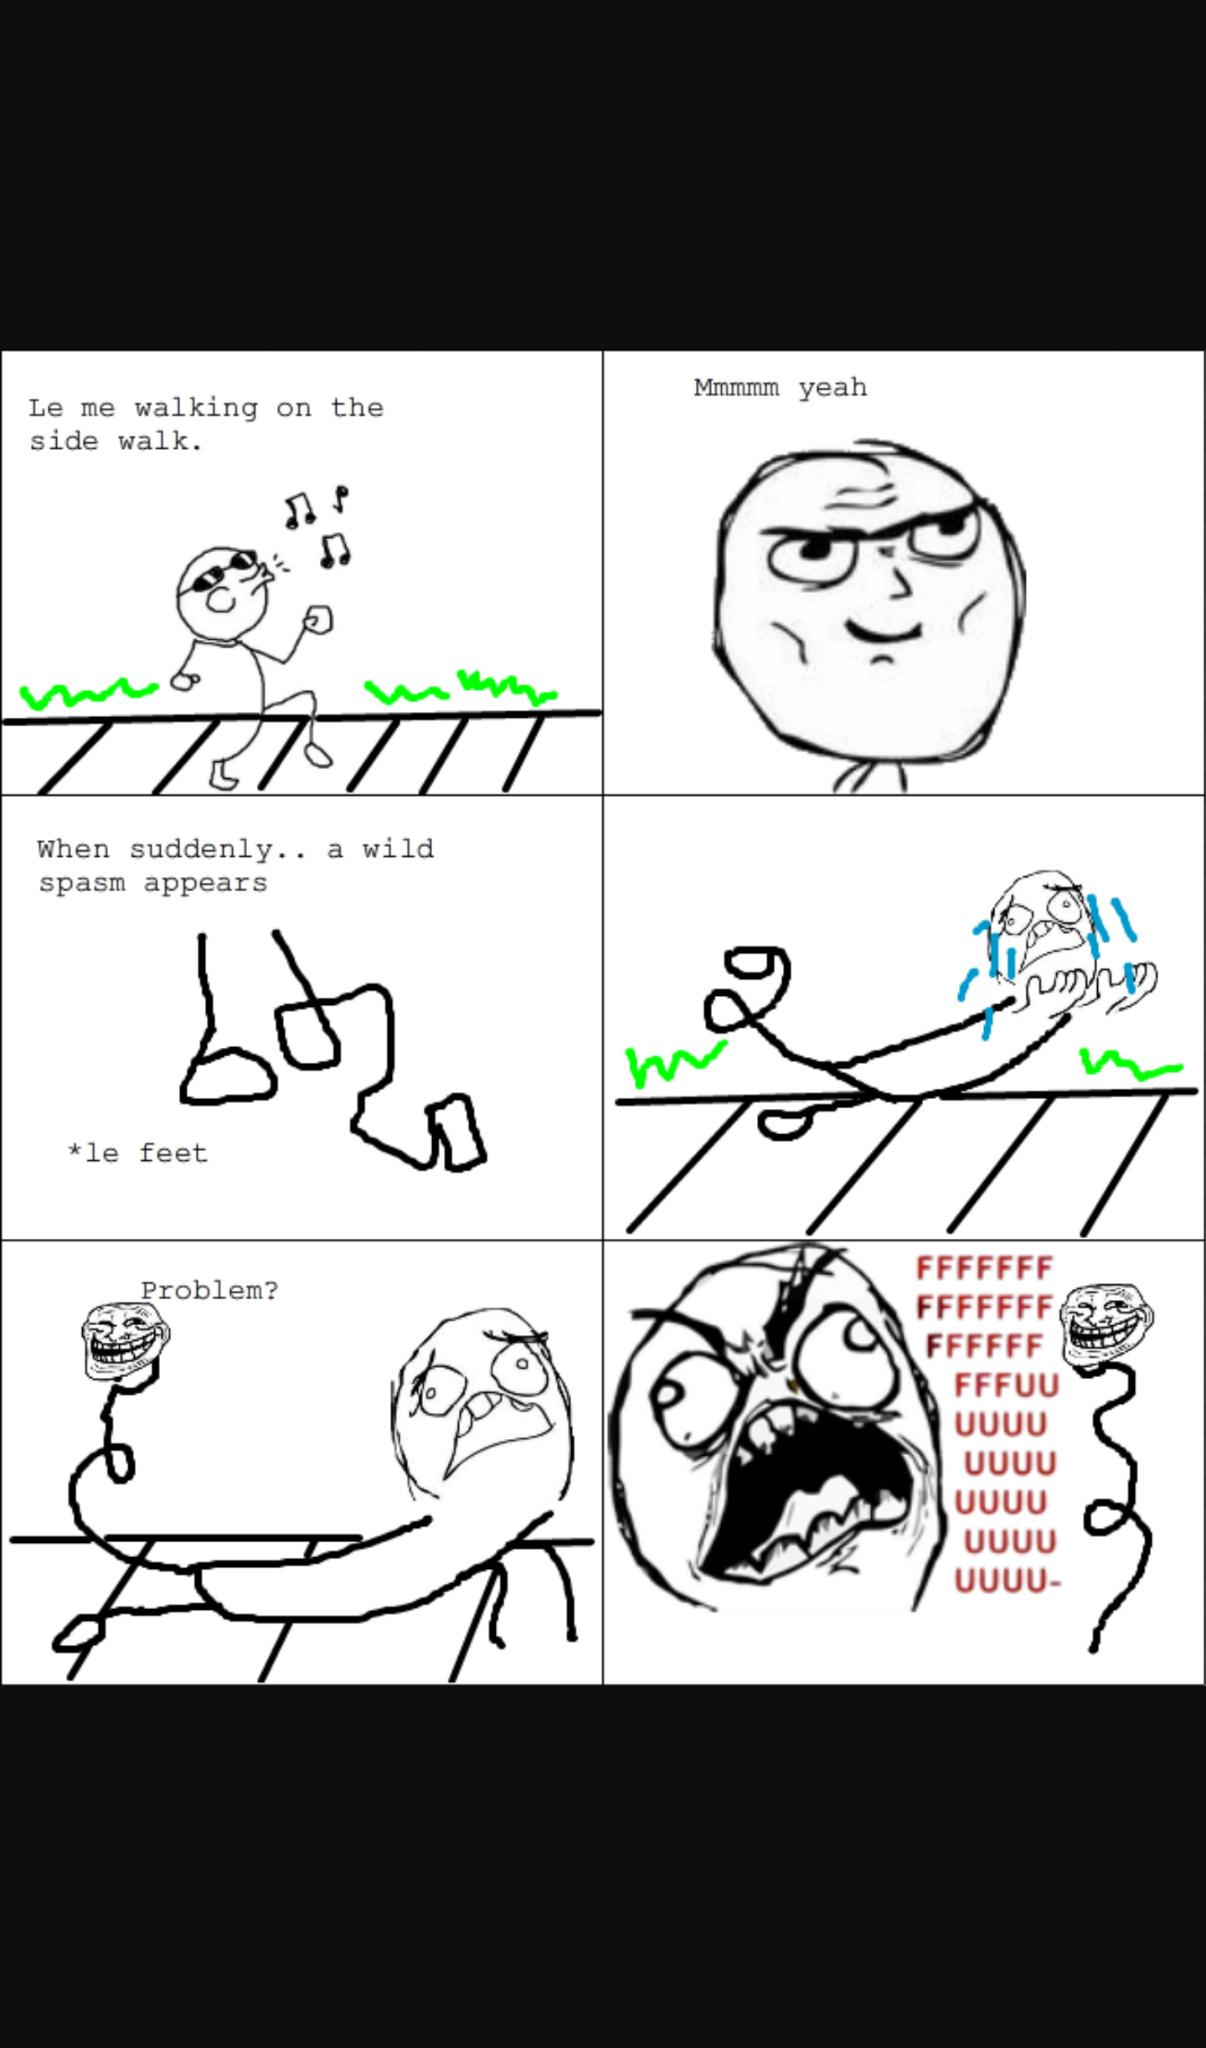 During gym class - meme